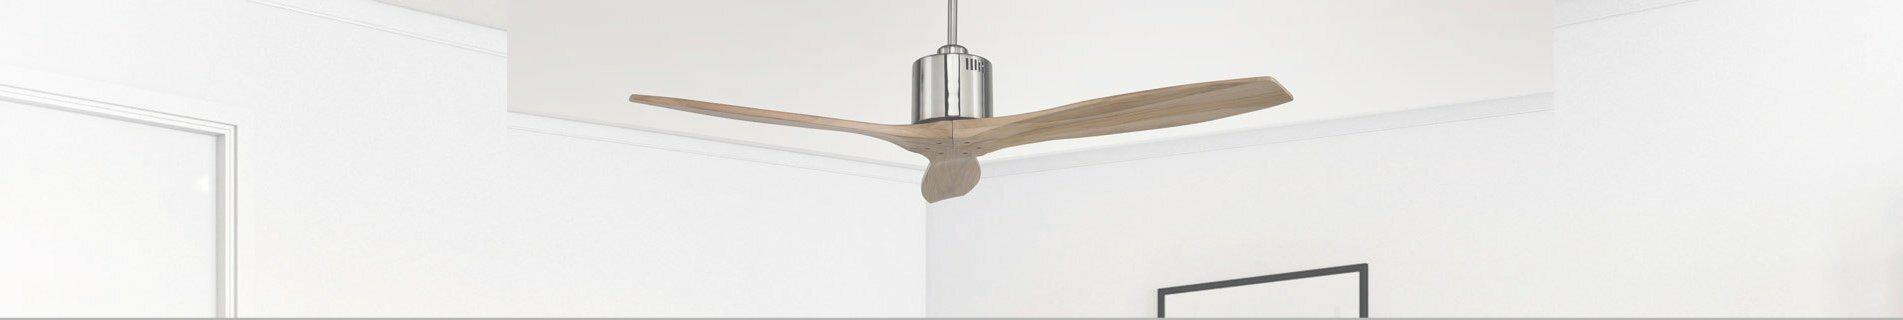 Ceiling Fans Smart Technology